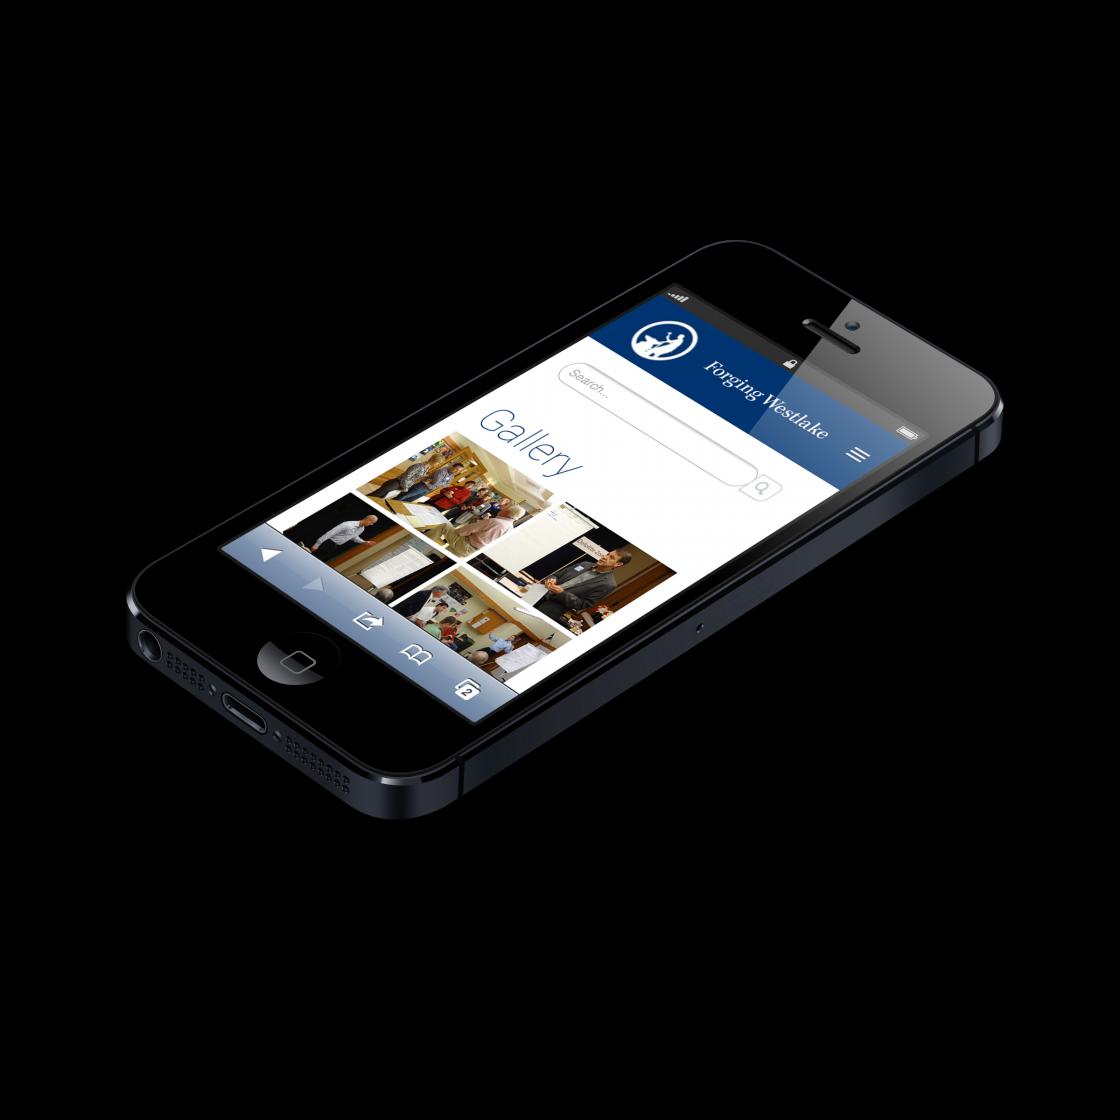 forgingwestlake-gallery-iphone5-3d-view